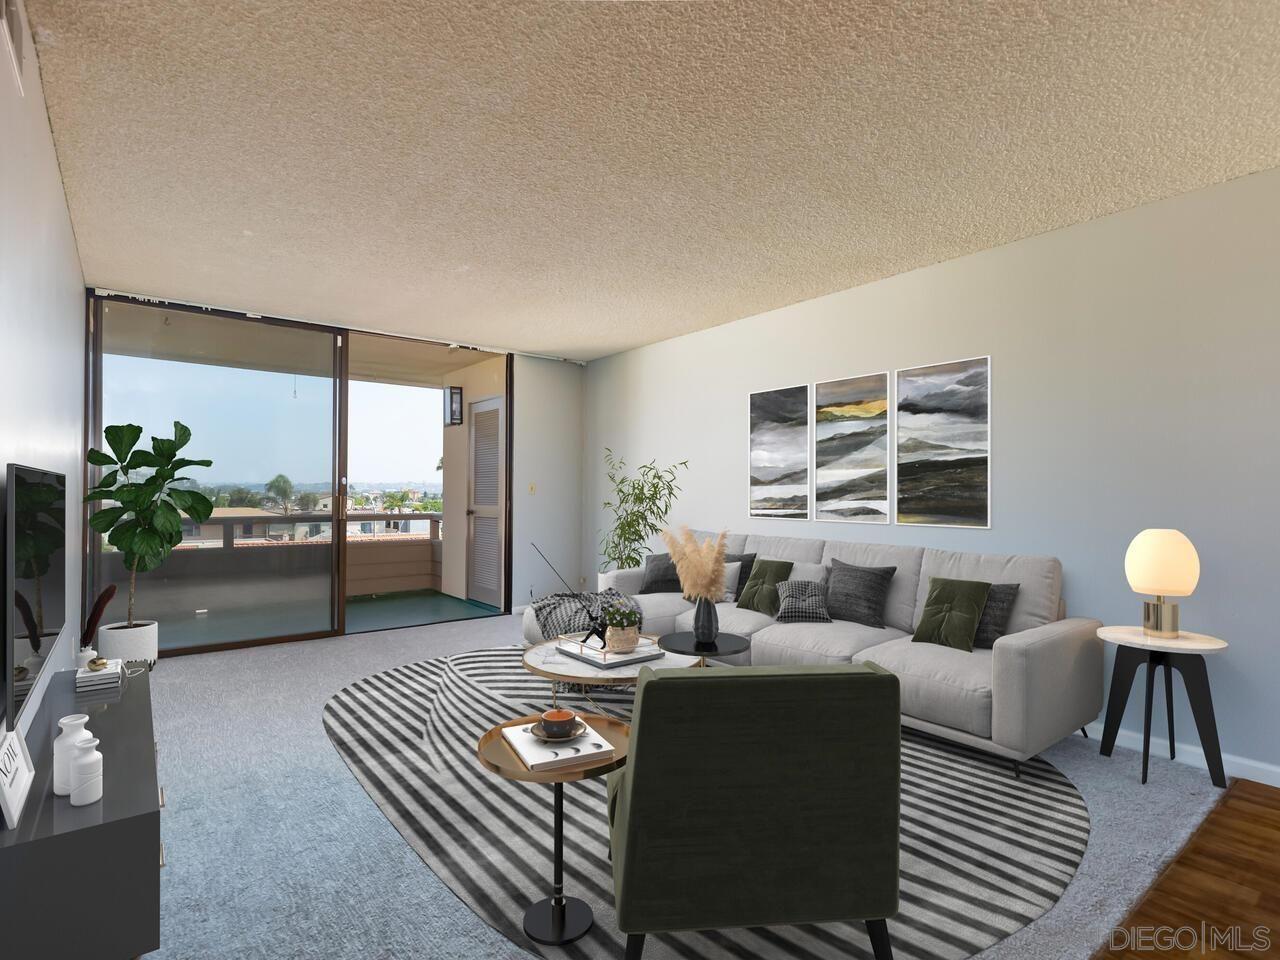 Main Photo: POINT LOMA Condo for sale : 2 bedrooms : 3130 Avenida De Portugal #302 in San Diego